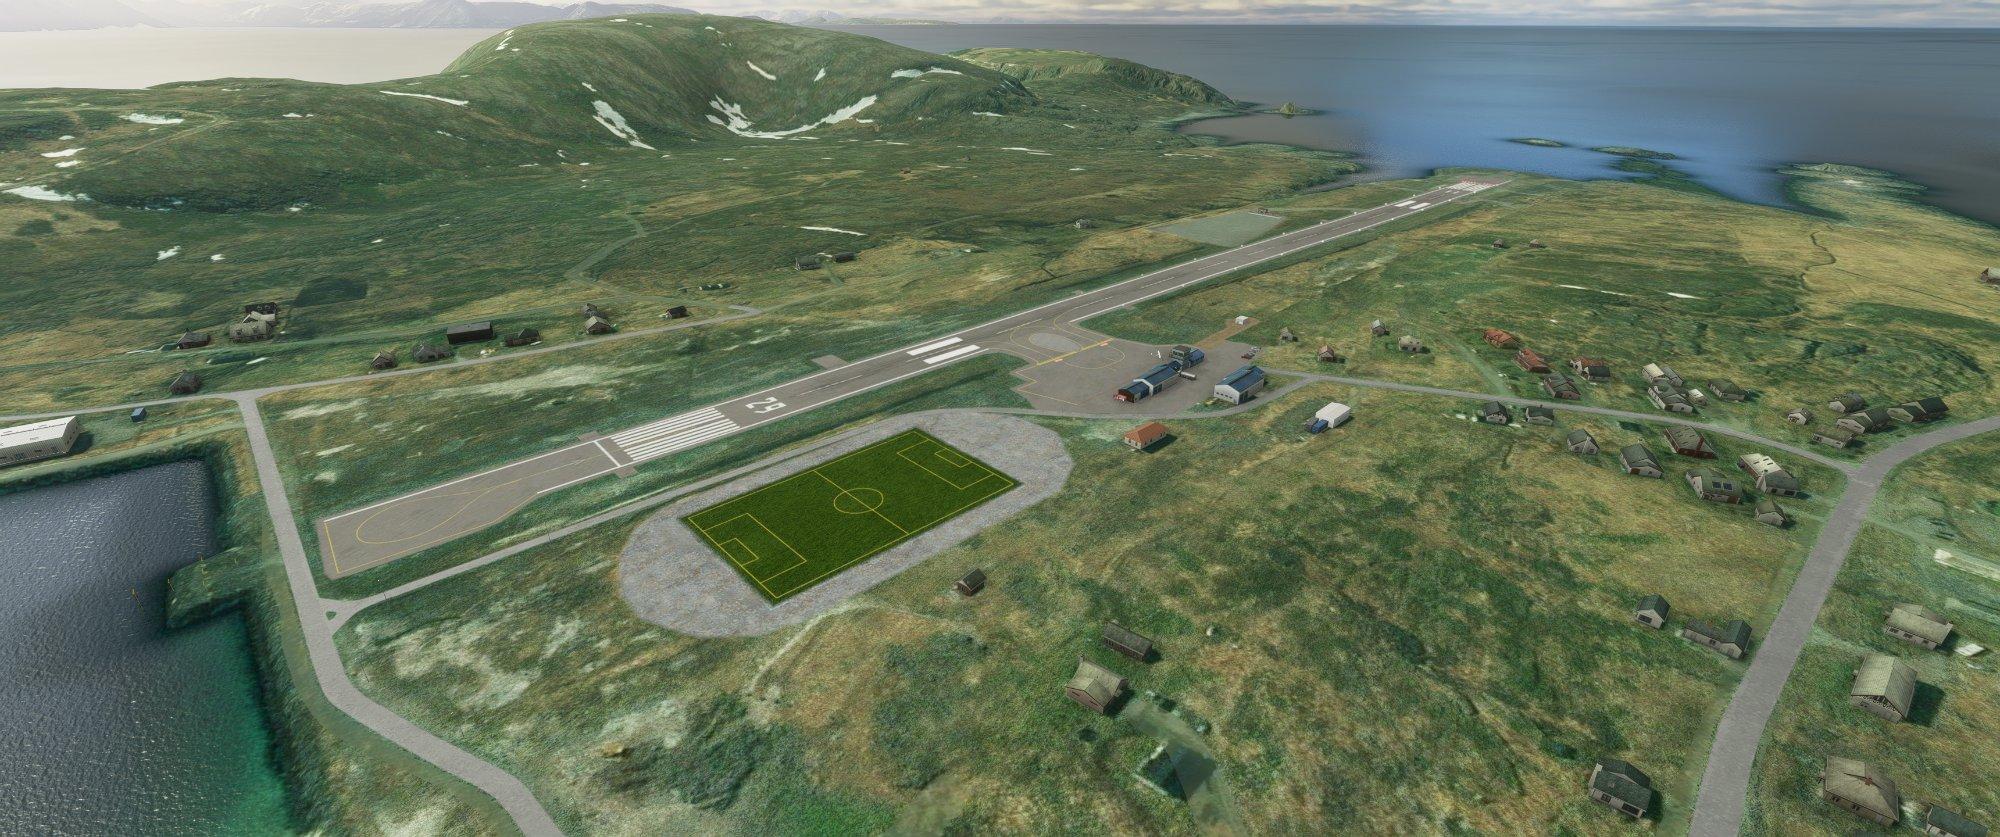 Microsoft Flight Simulator Screenshot 2021.06.21 - 23.01.11.59.jpg